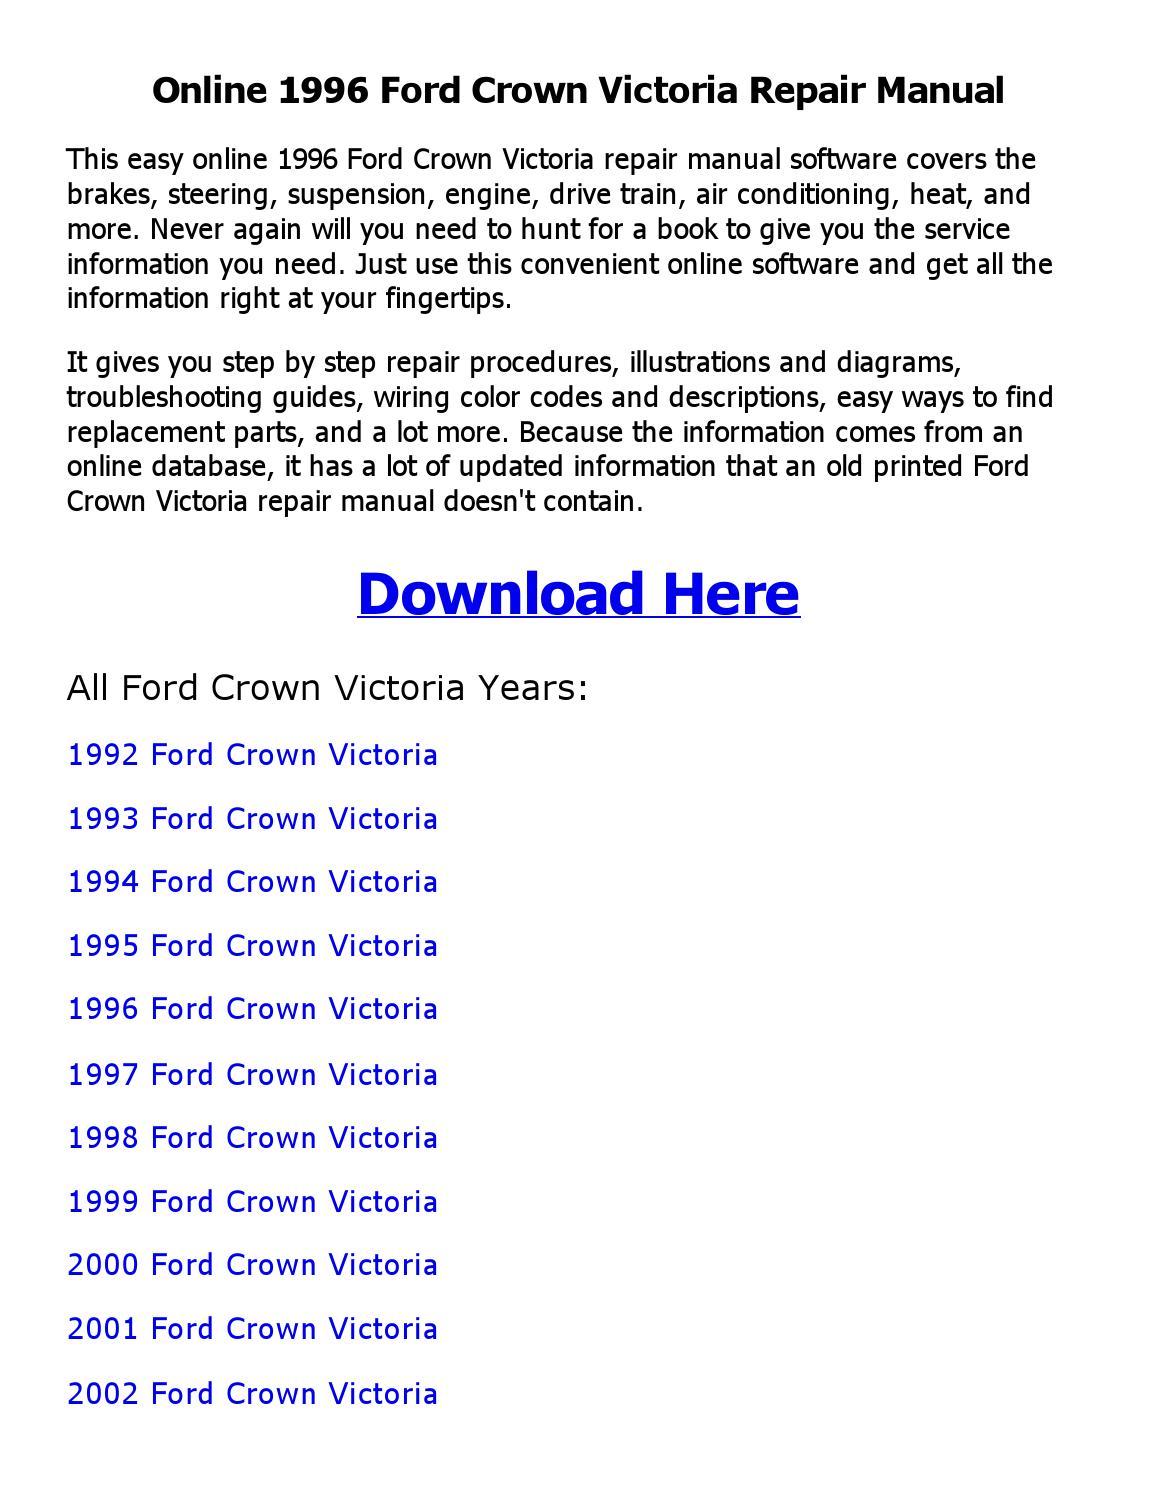 1996 Ford Crown Victoria Repair Manual Online By Sajib